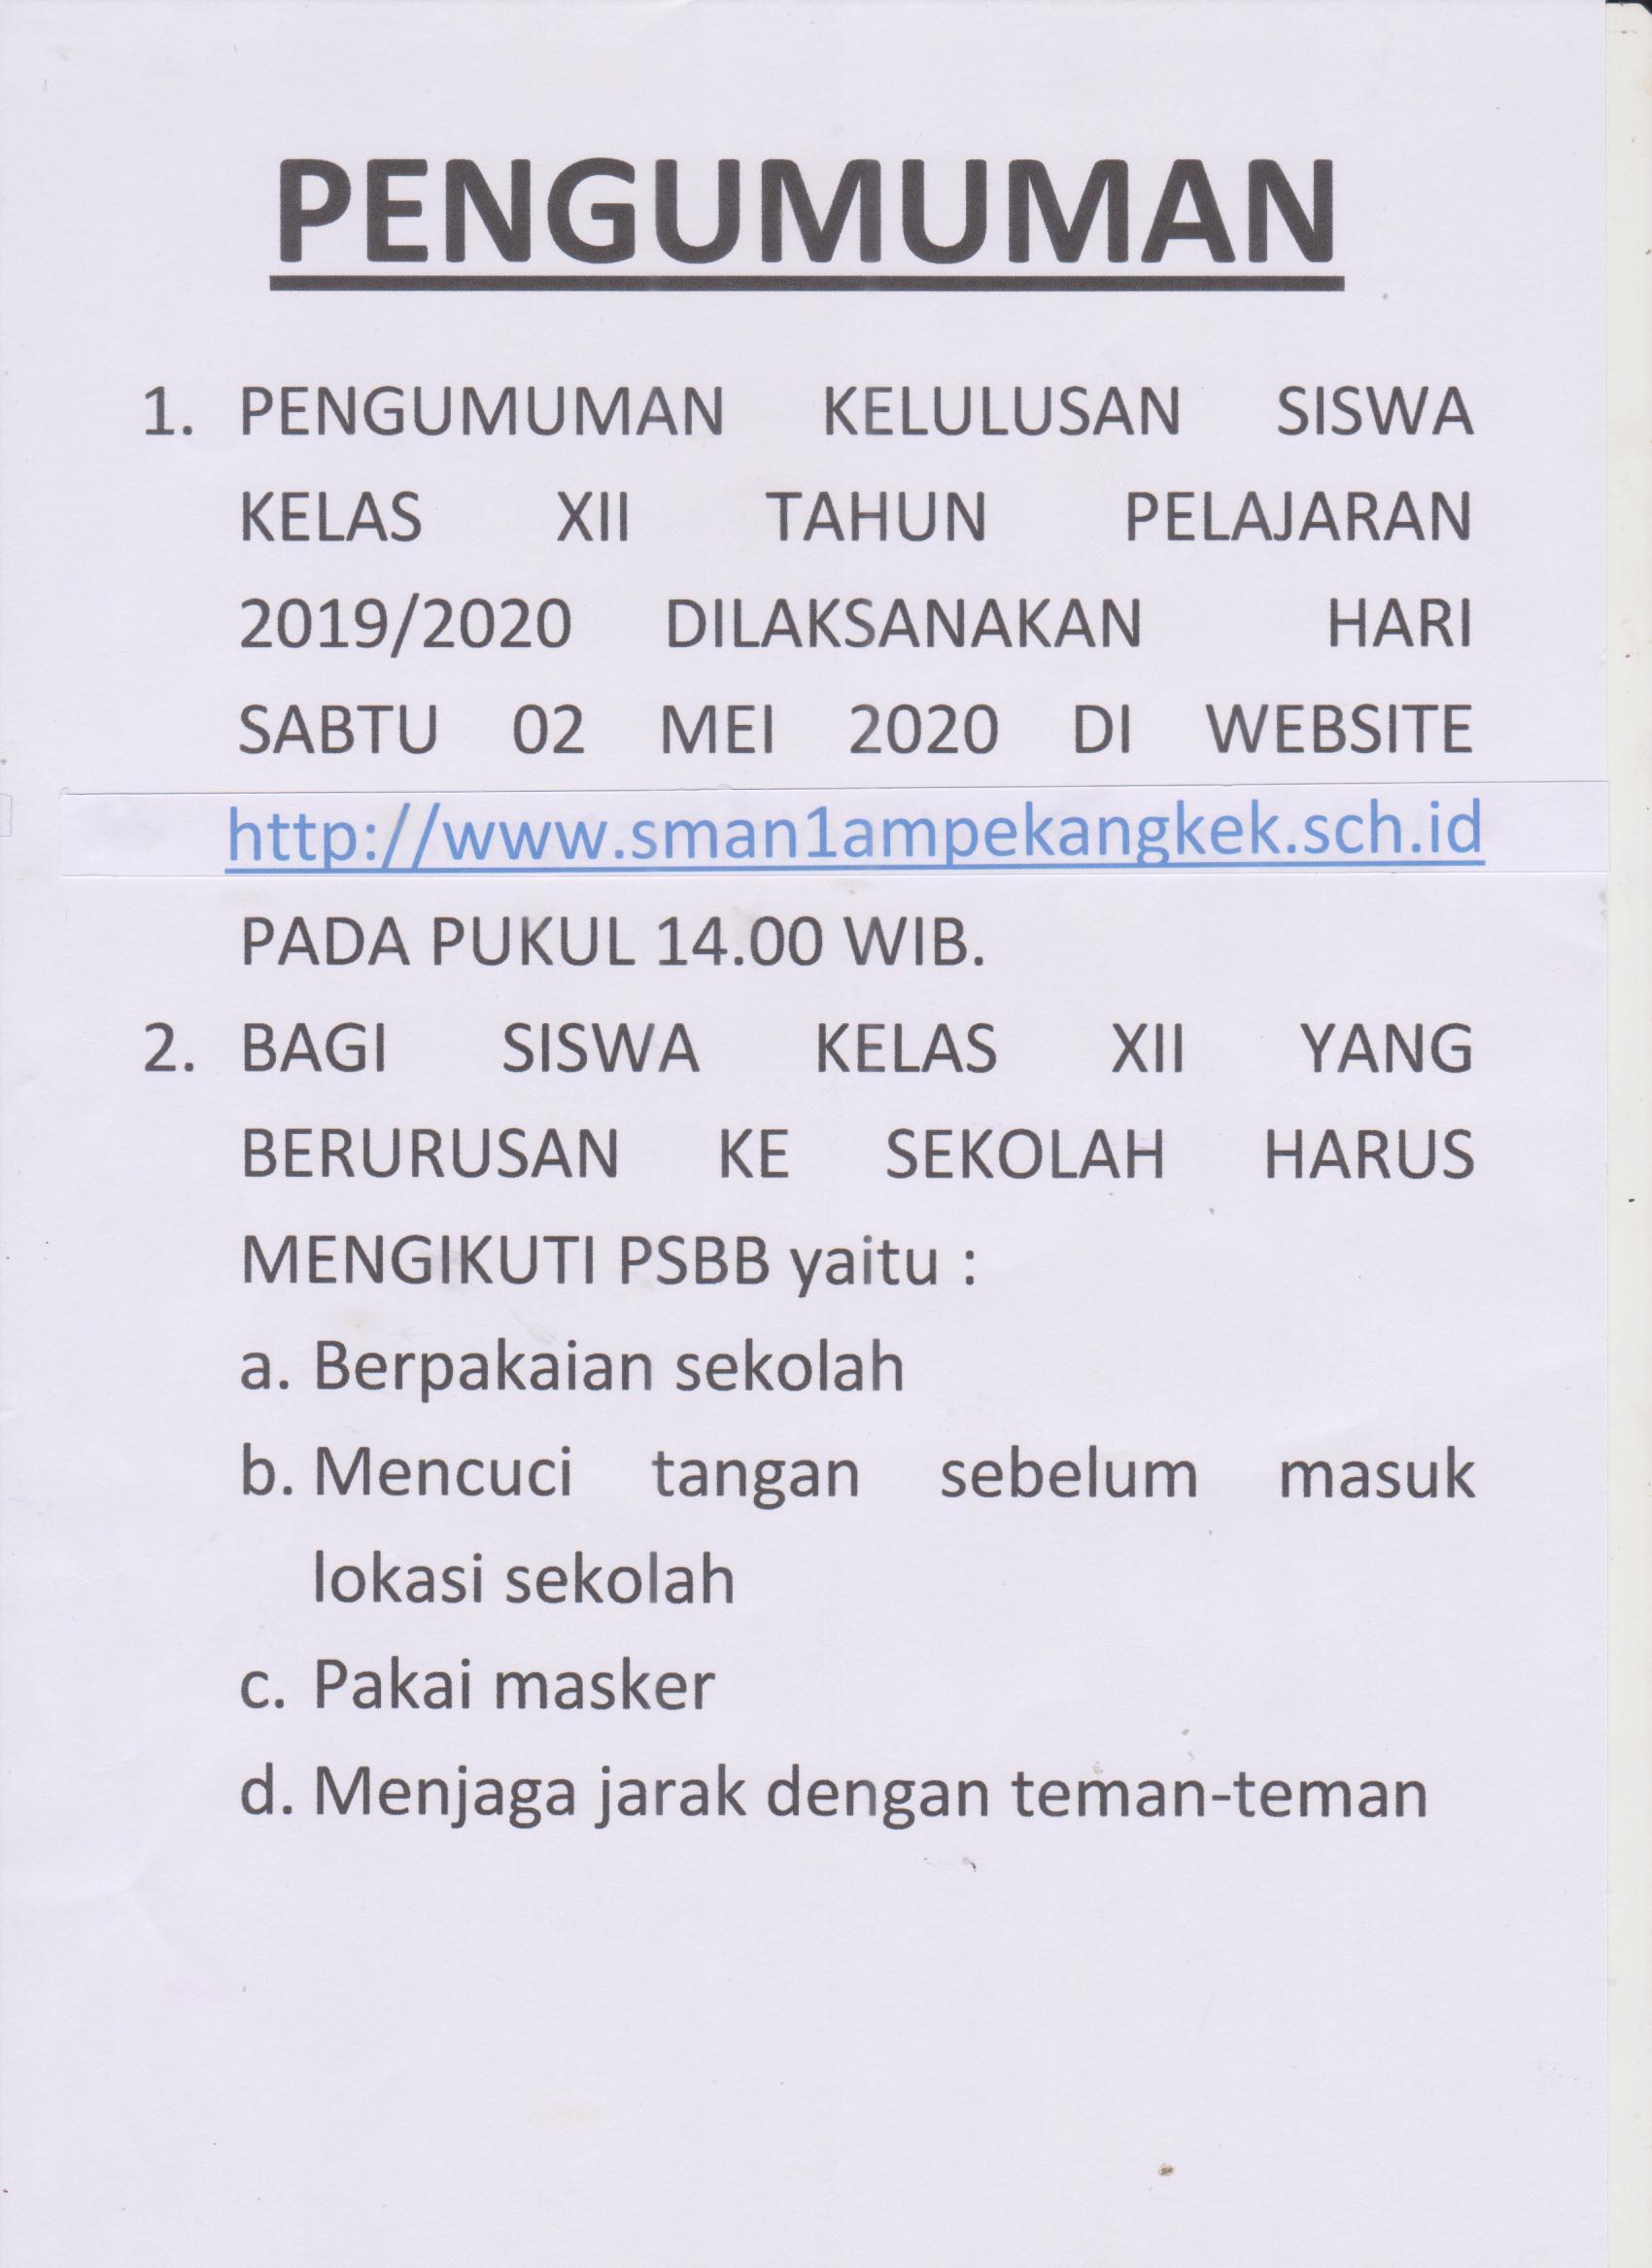 Pengumuman kelulusan kelas XII TP. 2019-2020